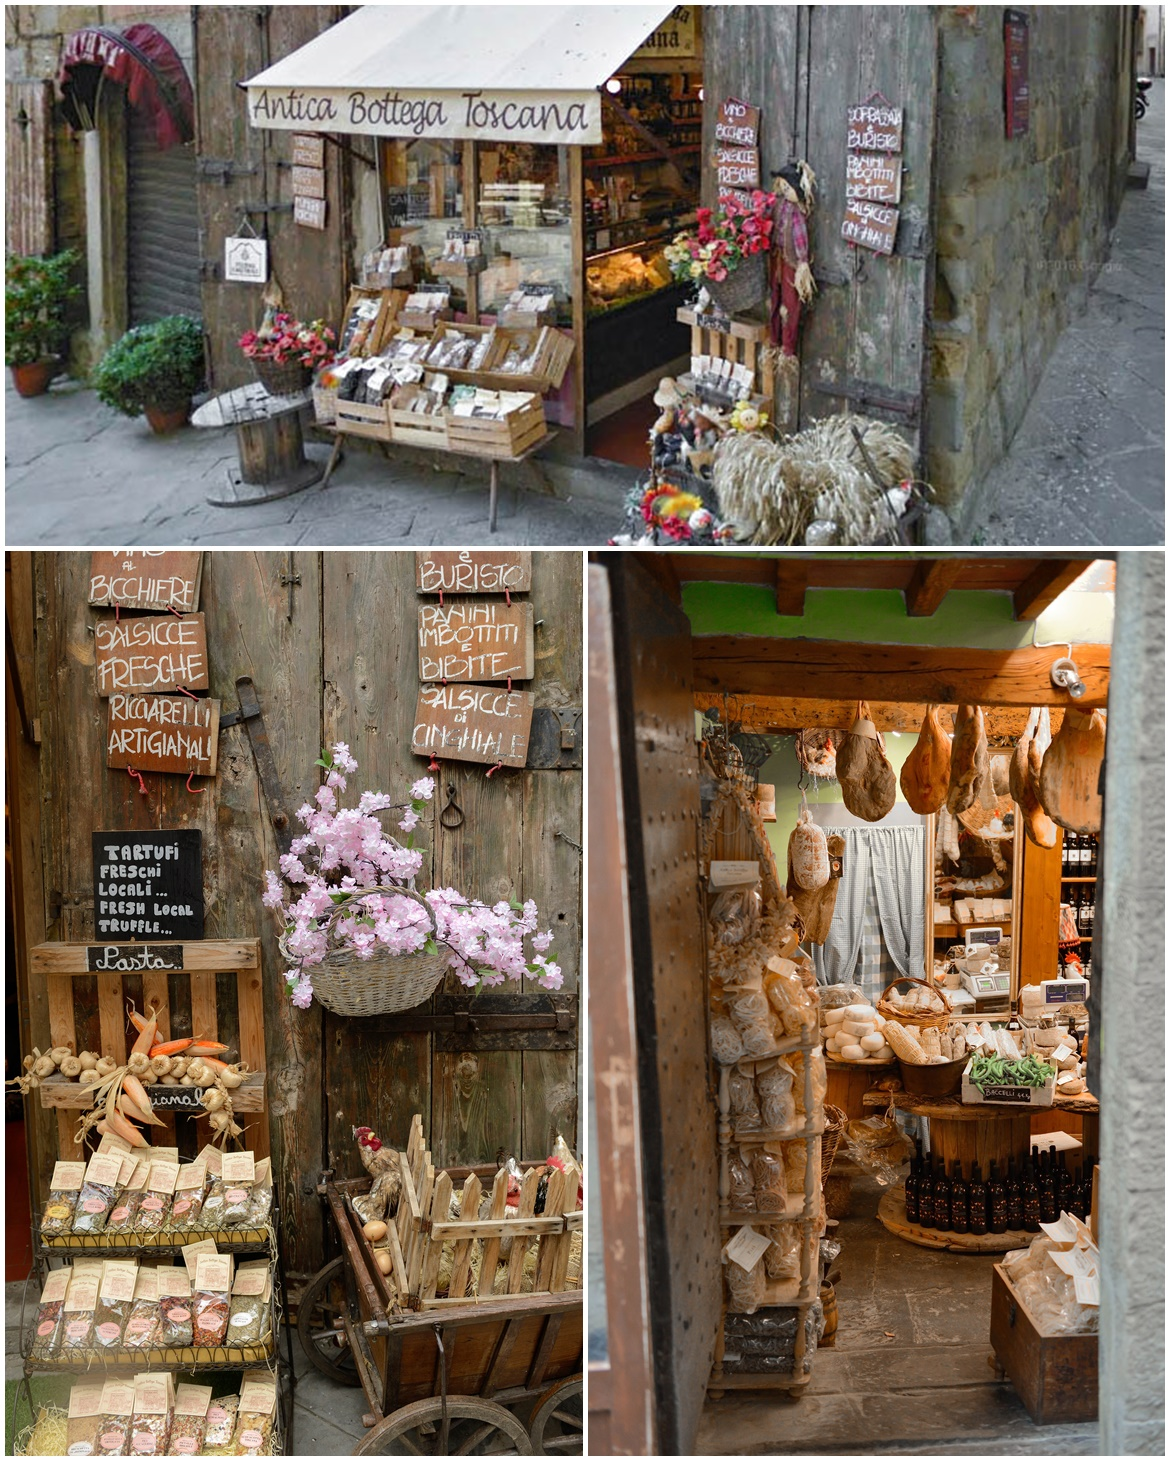 Arezzo Antica Bottega